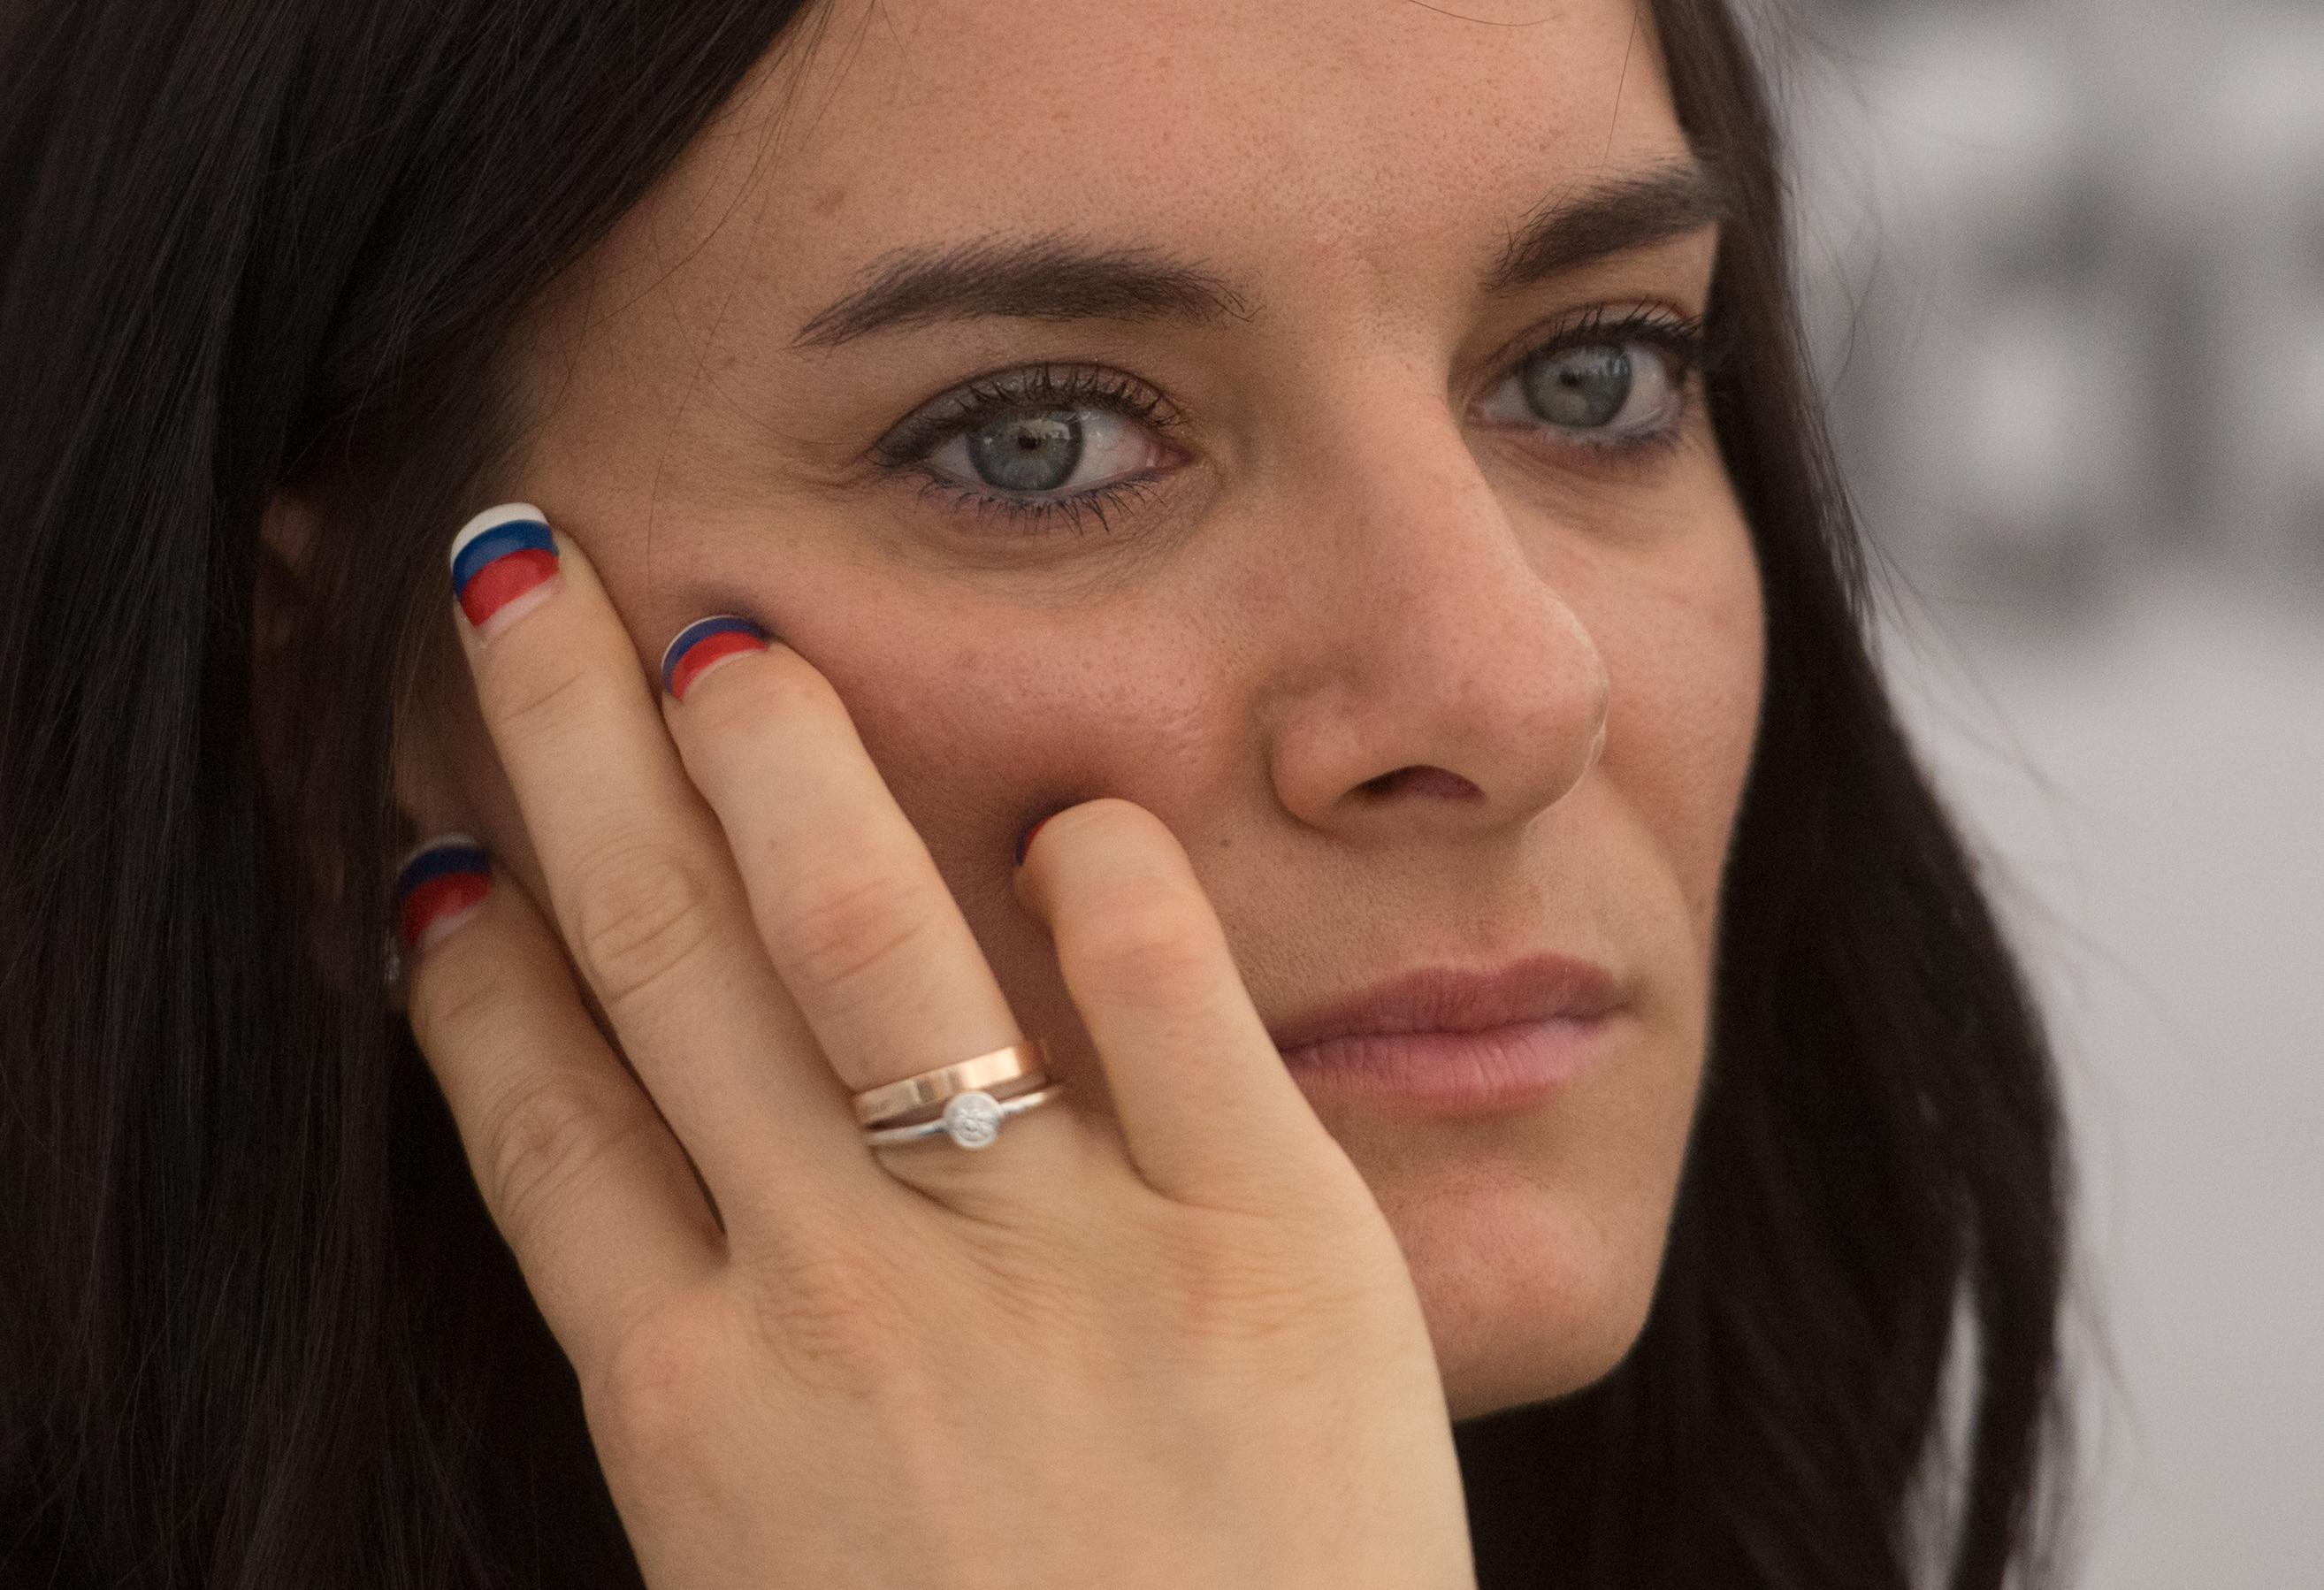 <p>Фото: <span>&copy;&nbsp;</span>РИА Новости/Илья Питалев</p>